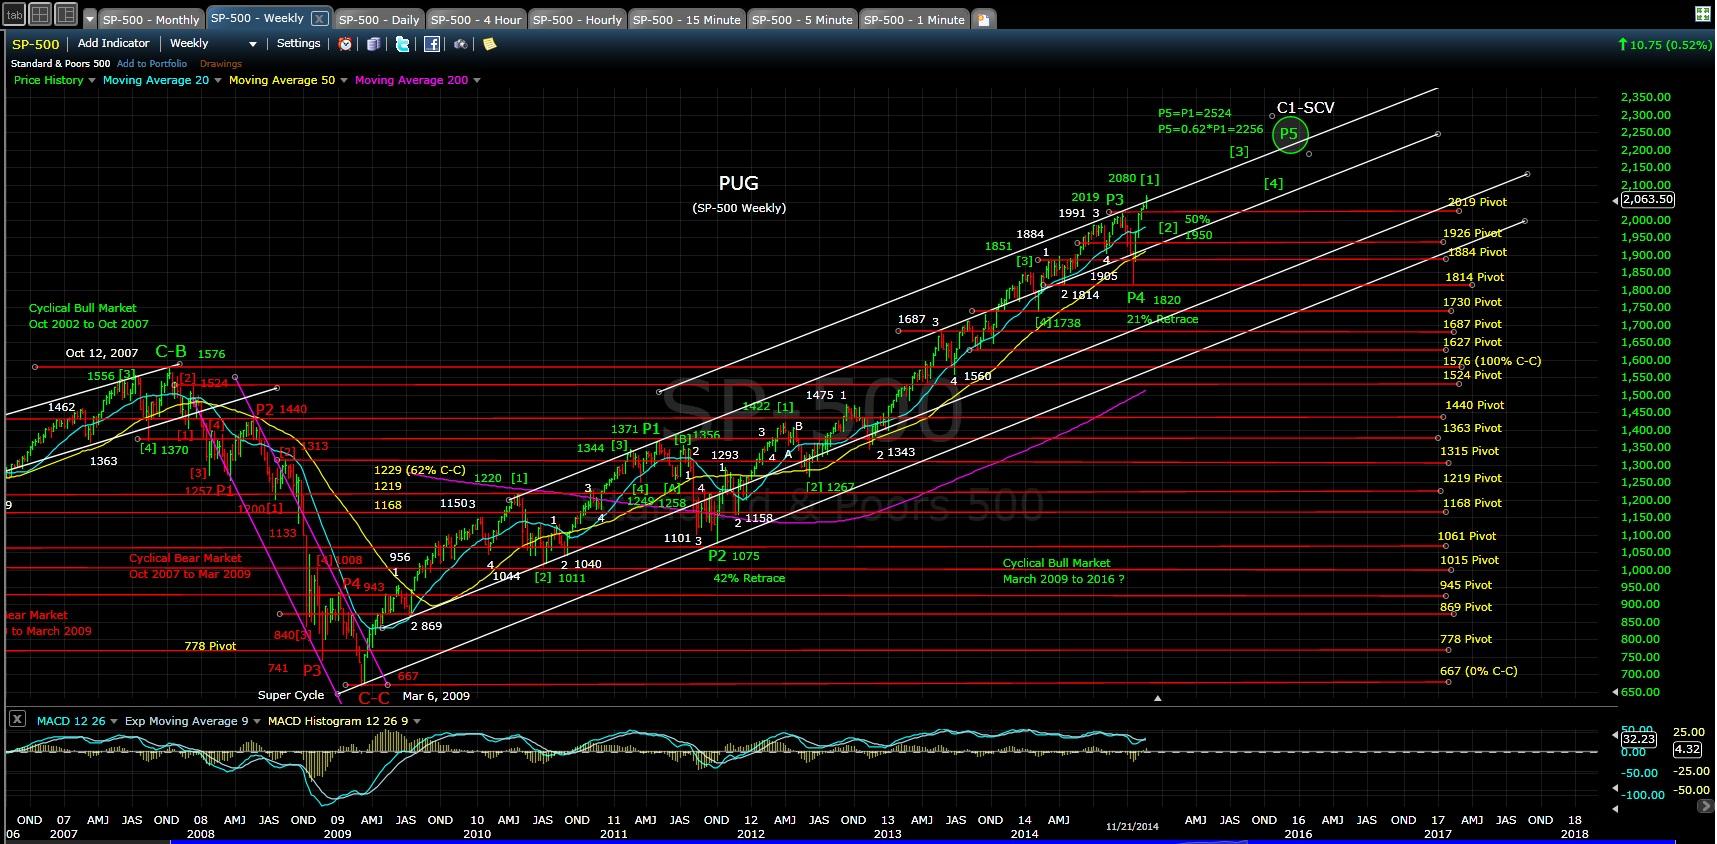 PUG SP-500 weekly chart EOD 11-21-14